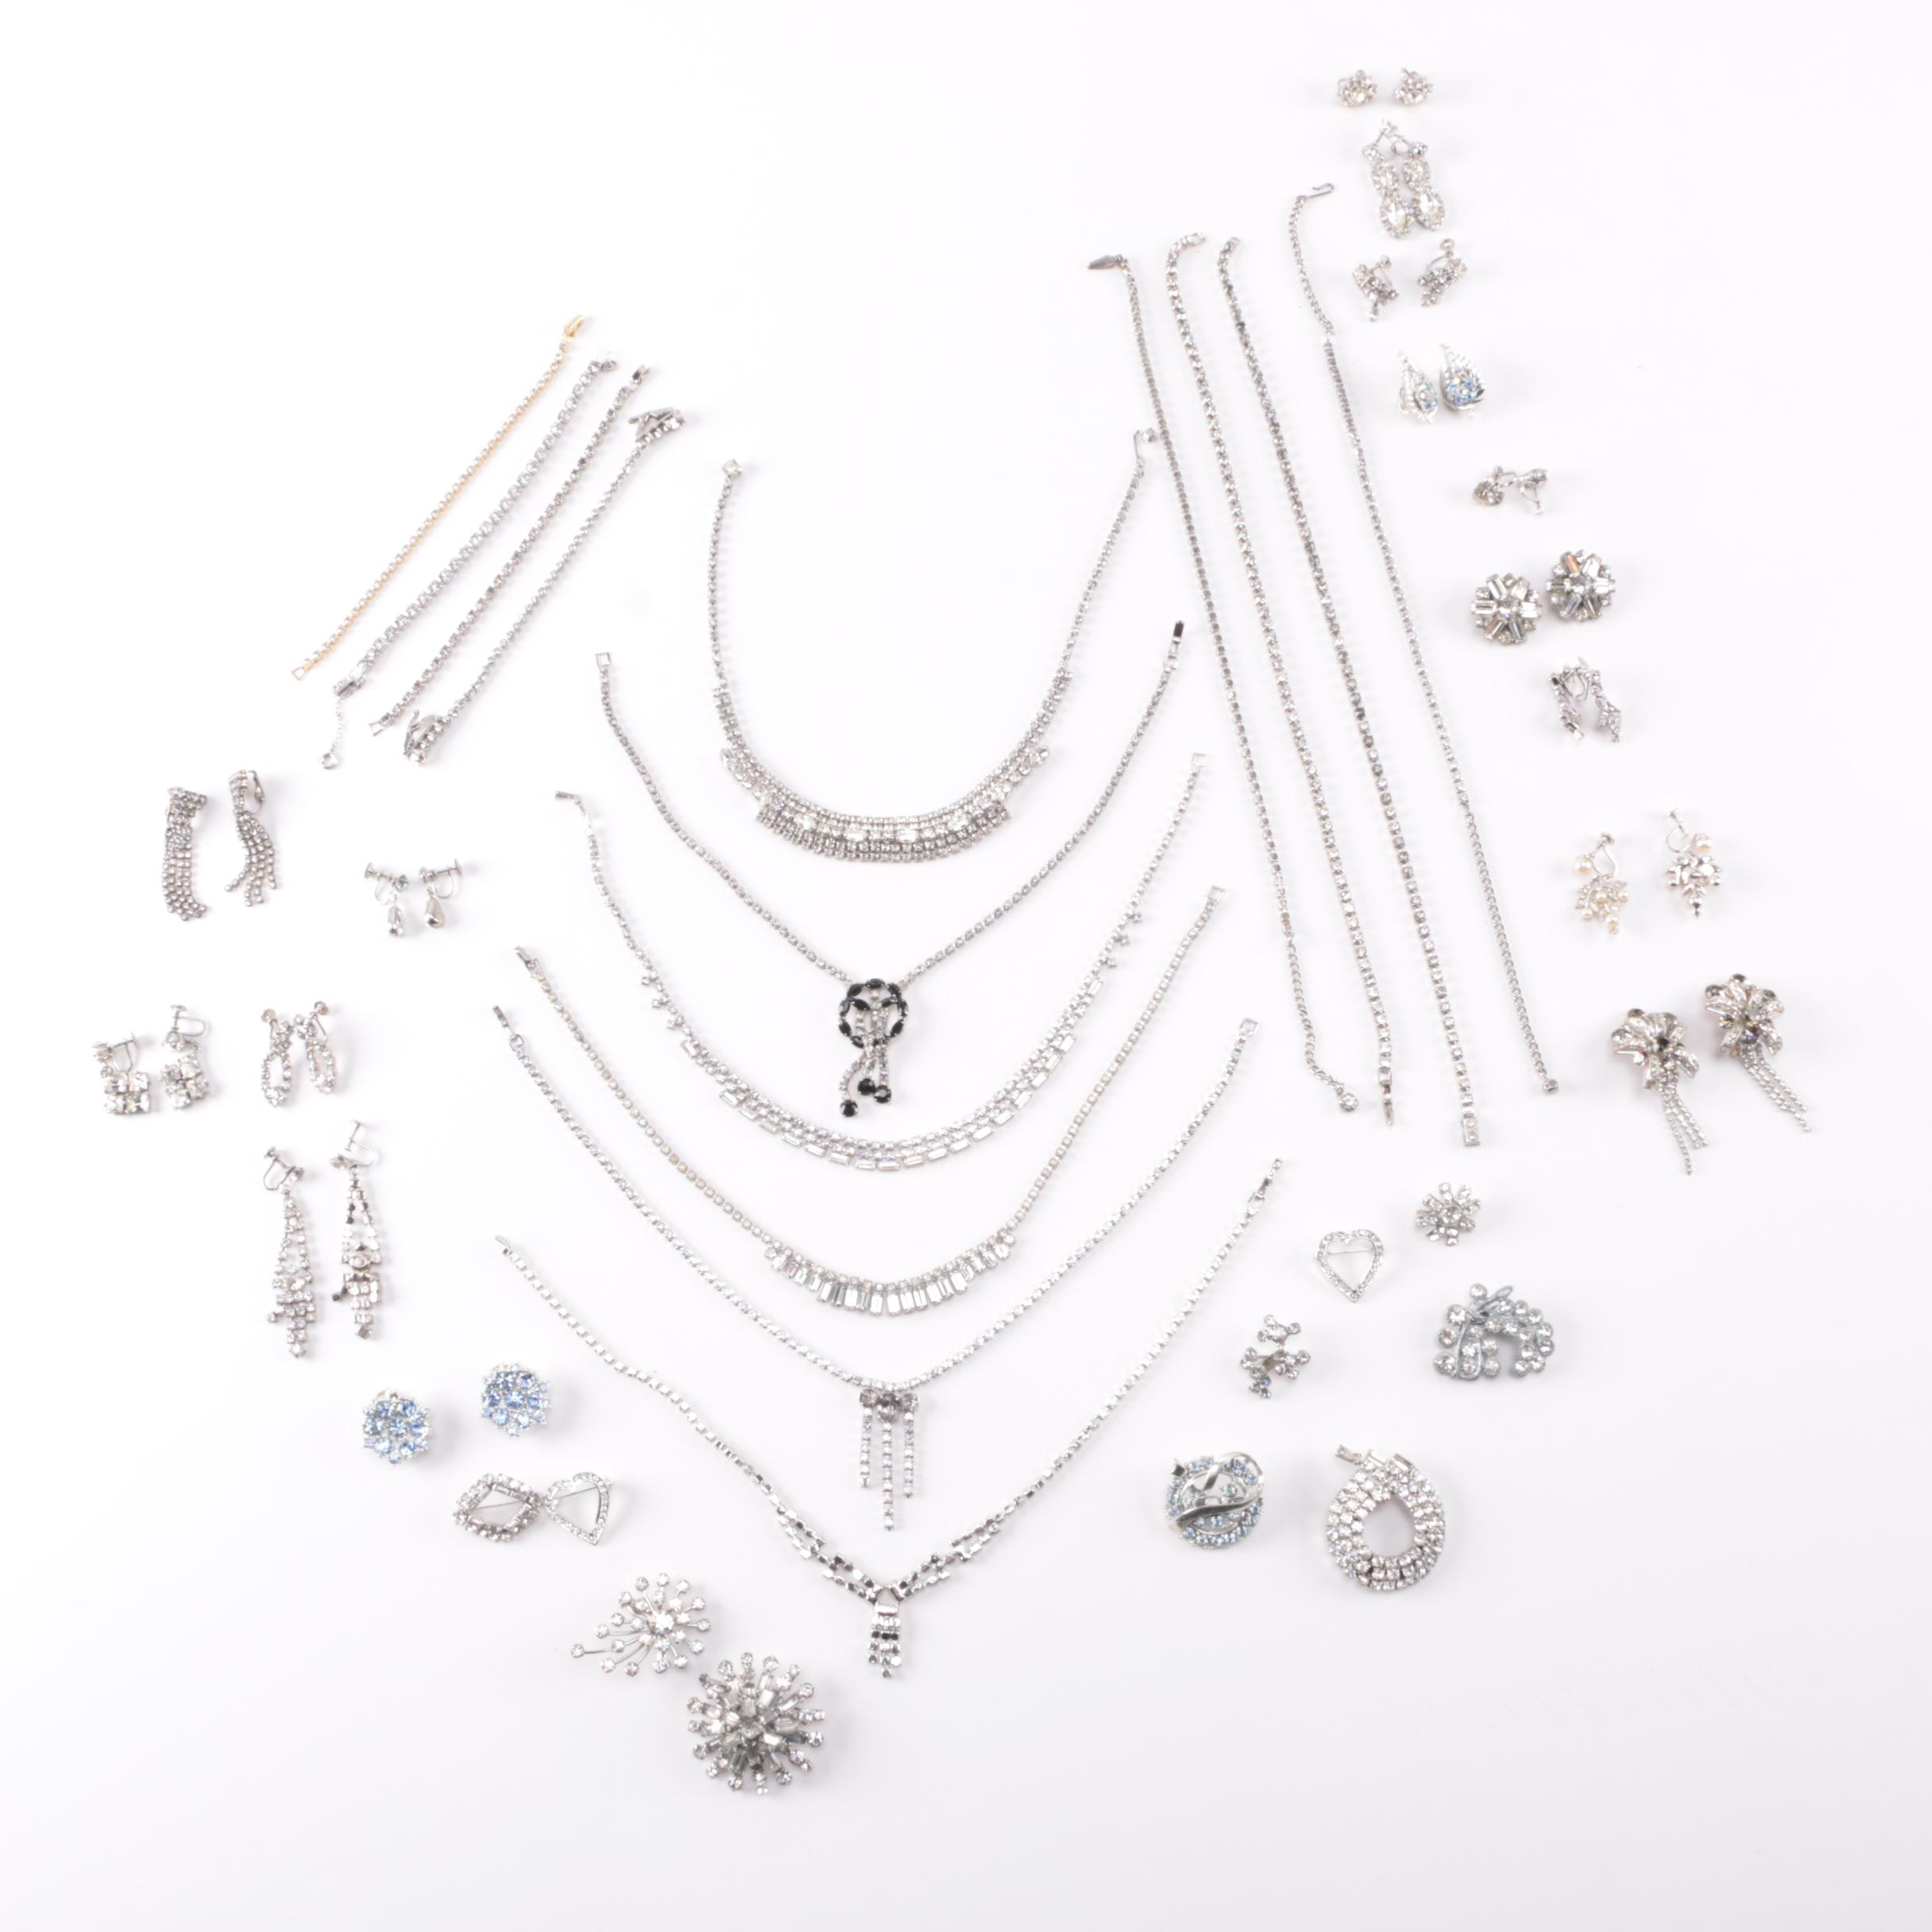 Large Assortment of Rhinestone Jewelry